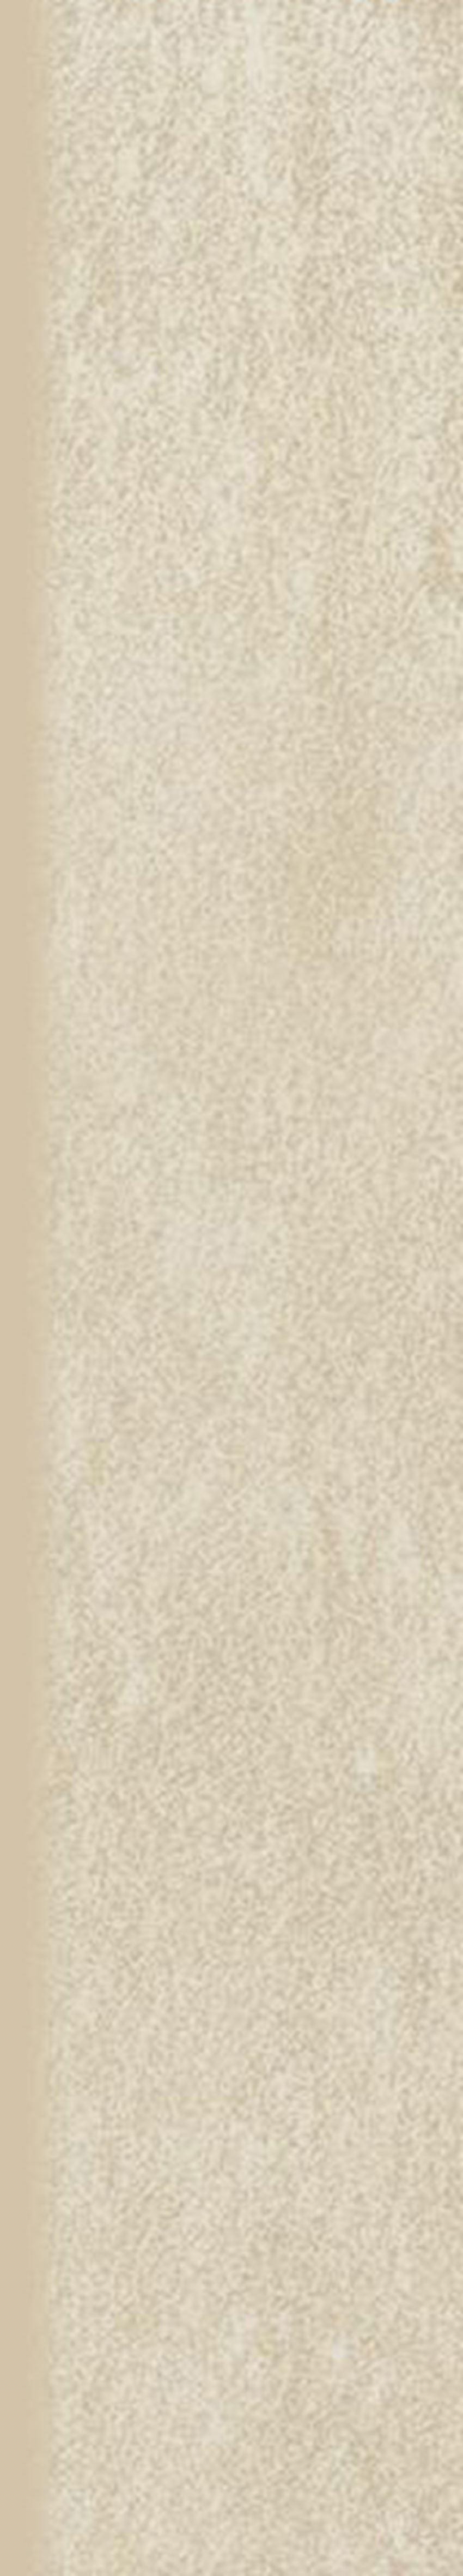 Płytka cokołowa 7,2x40 cm  Paradyż Sextans Beige Cokół Mat